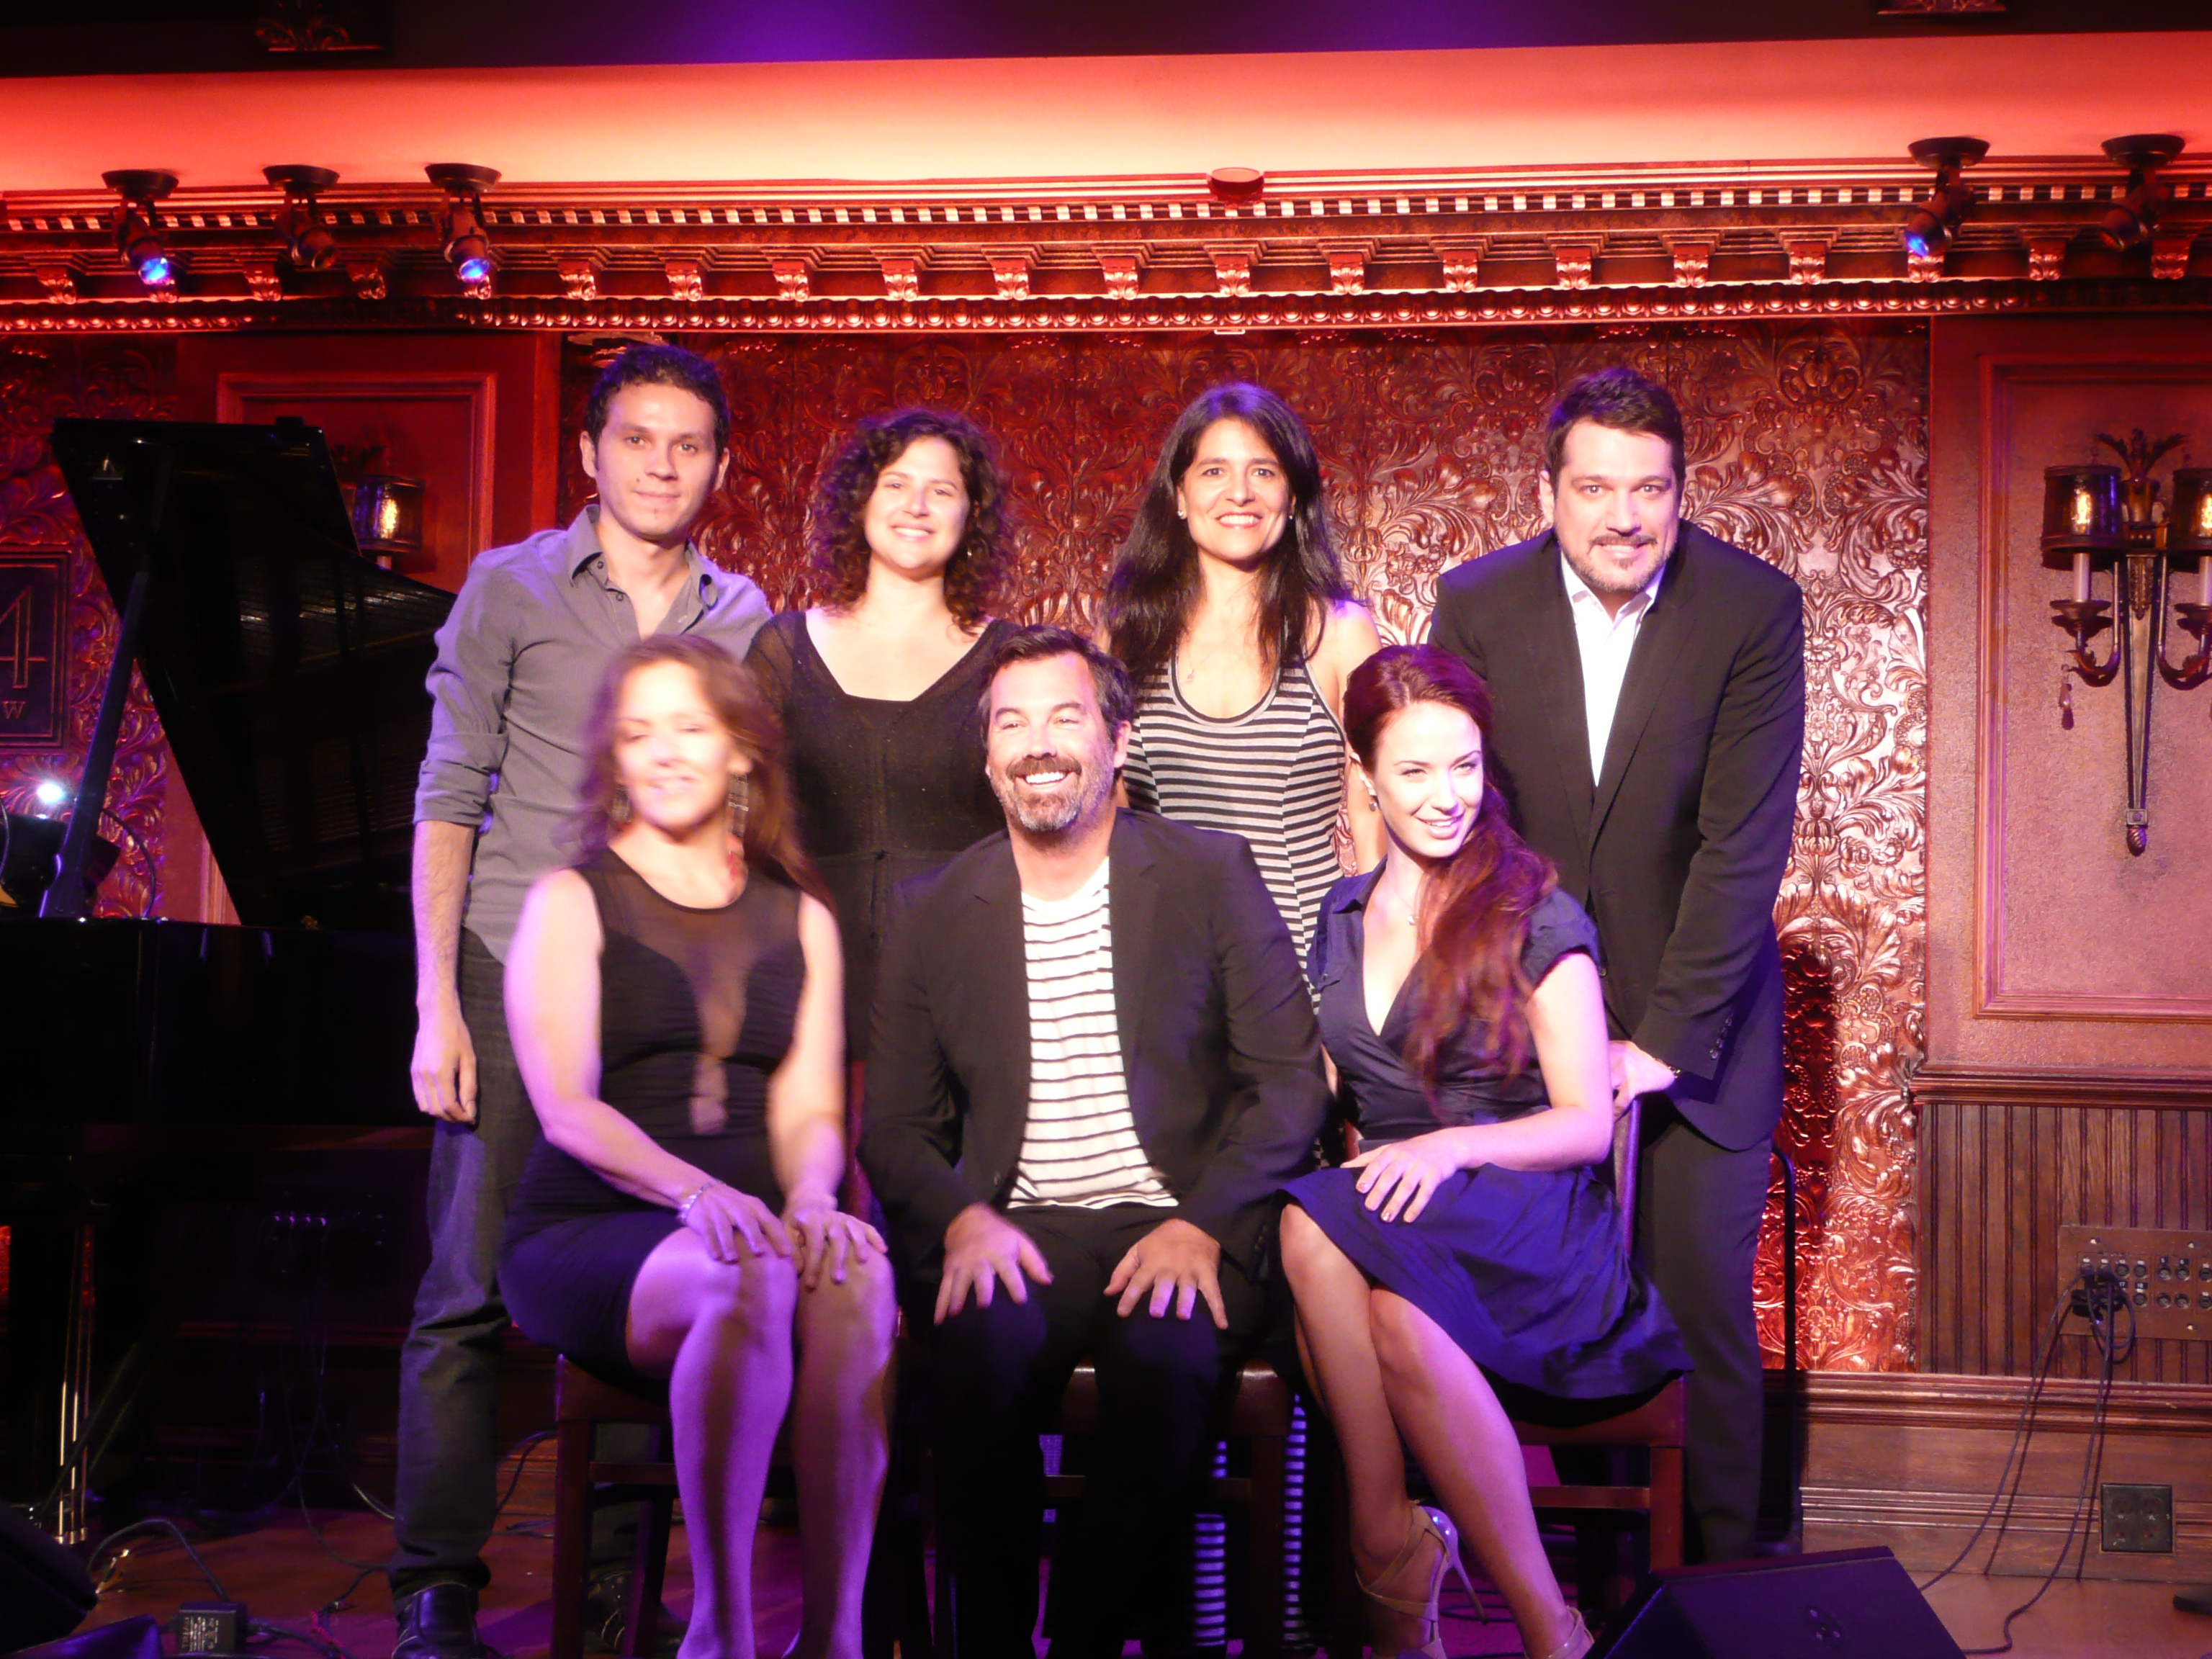 Broadway Celebs Coming to 54 Below – Alice Ripley, Paulo Szot, Sierra Boggess, Duncan Sheik more!